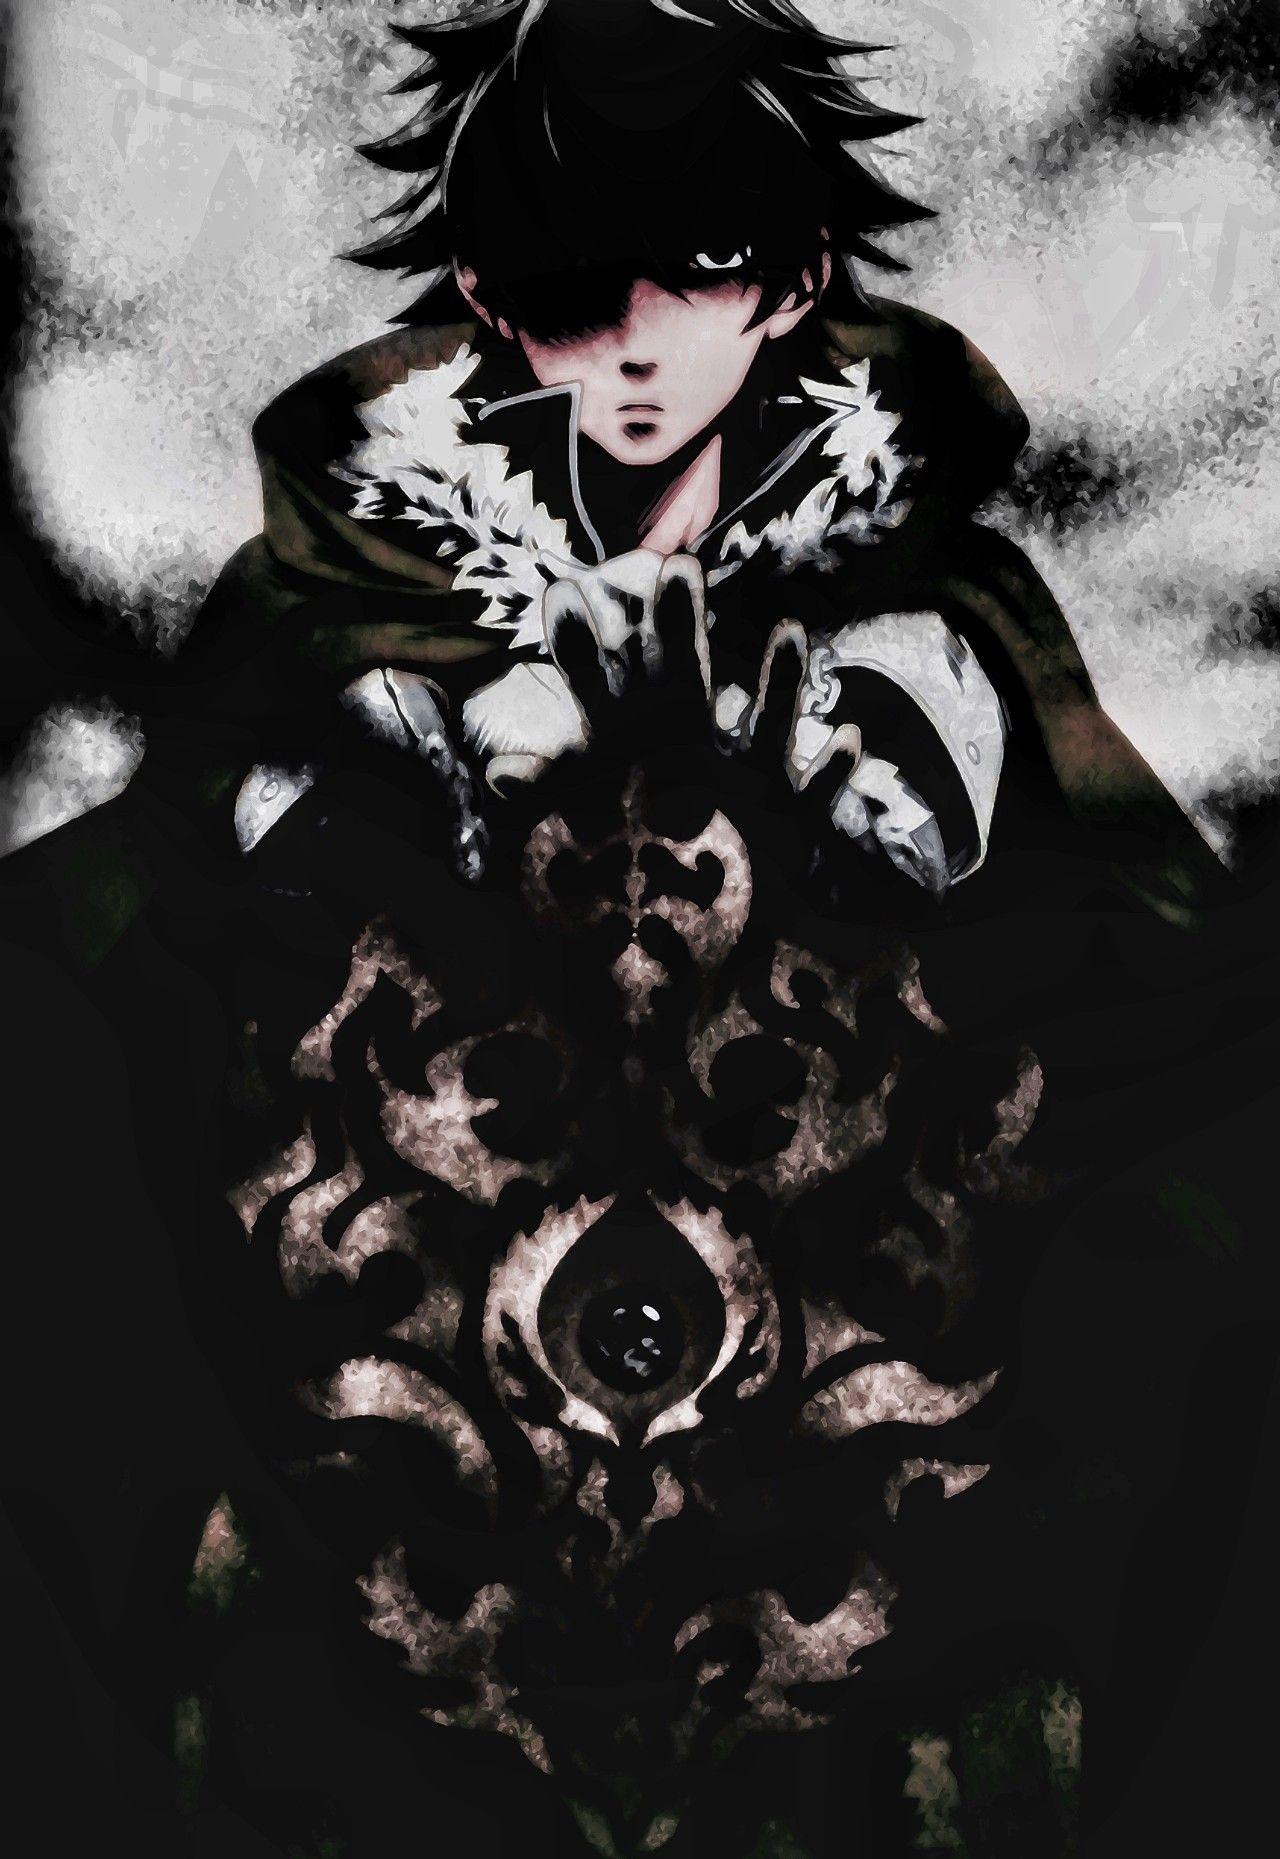 The Rising Of The Shield Hero Naofumi Iwatani Wrath Series Anime Wolf Girl Anime Soul Hero Wallpaper